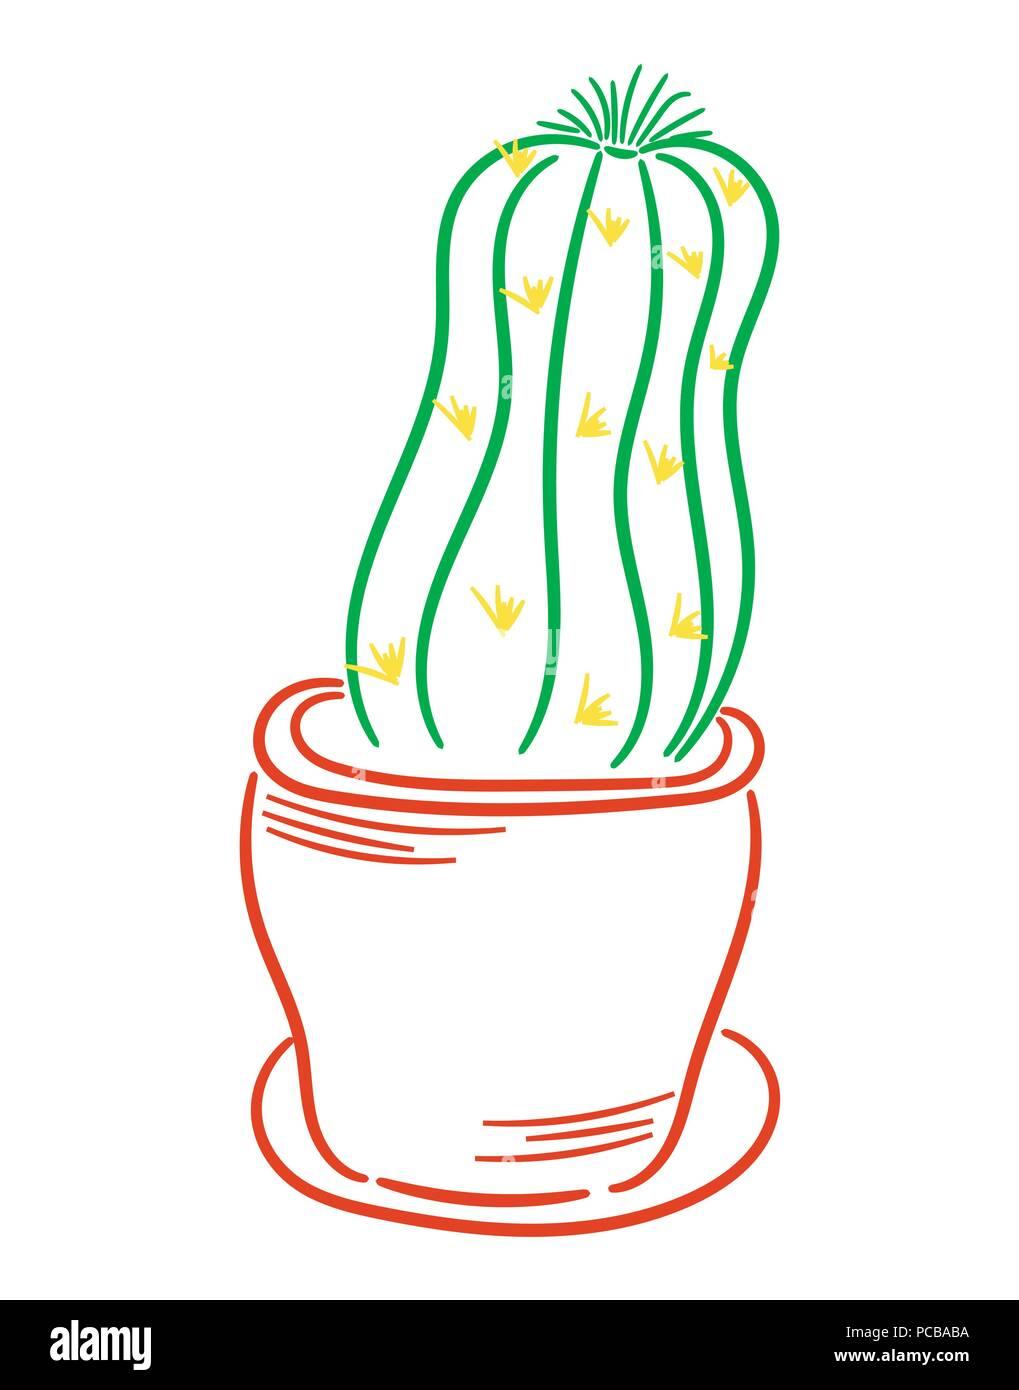 cactus in a pot vector - Stock Image